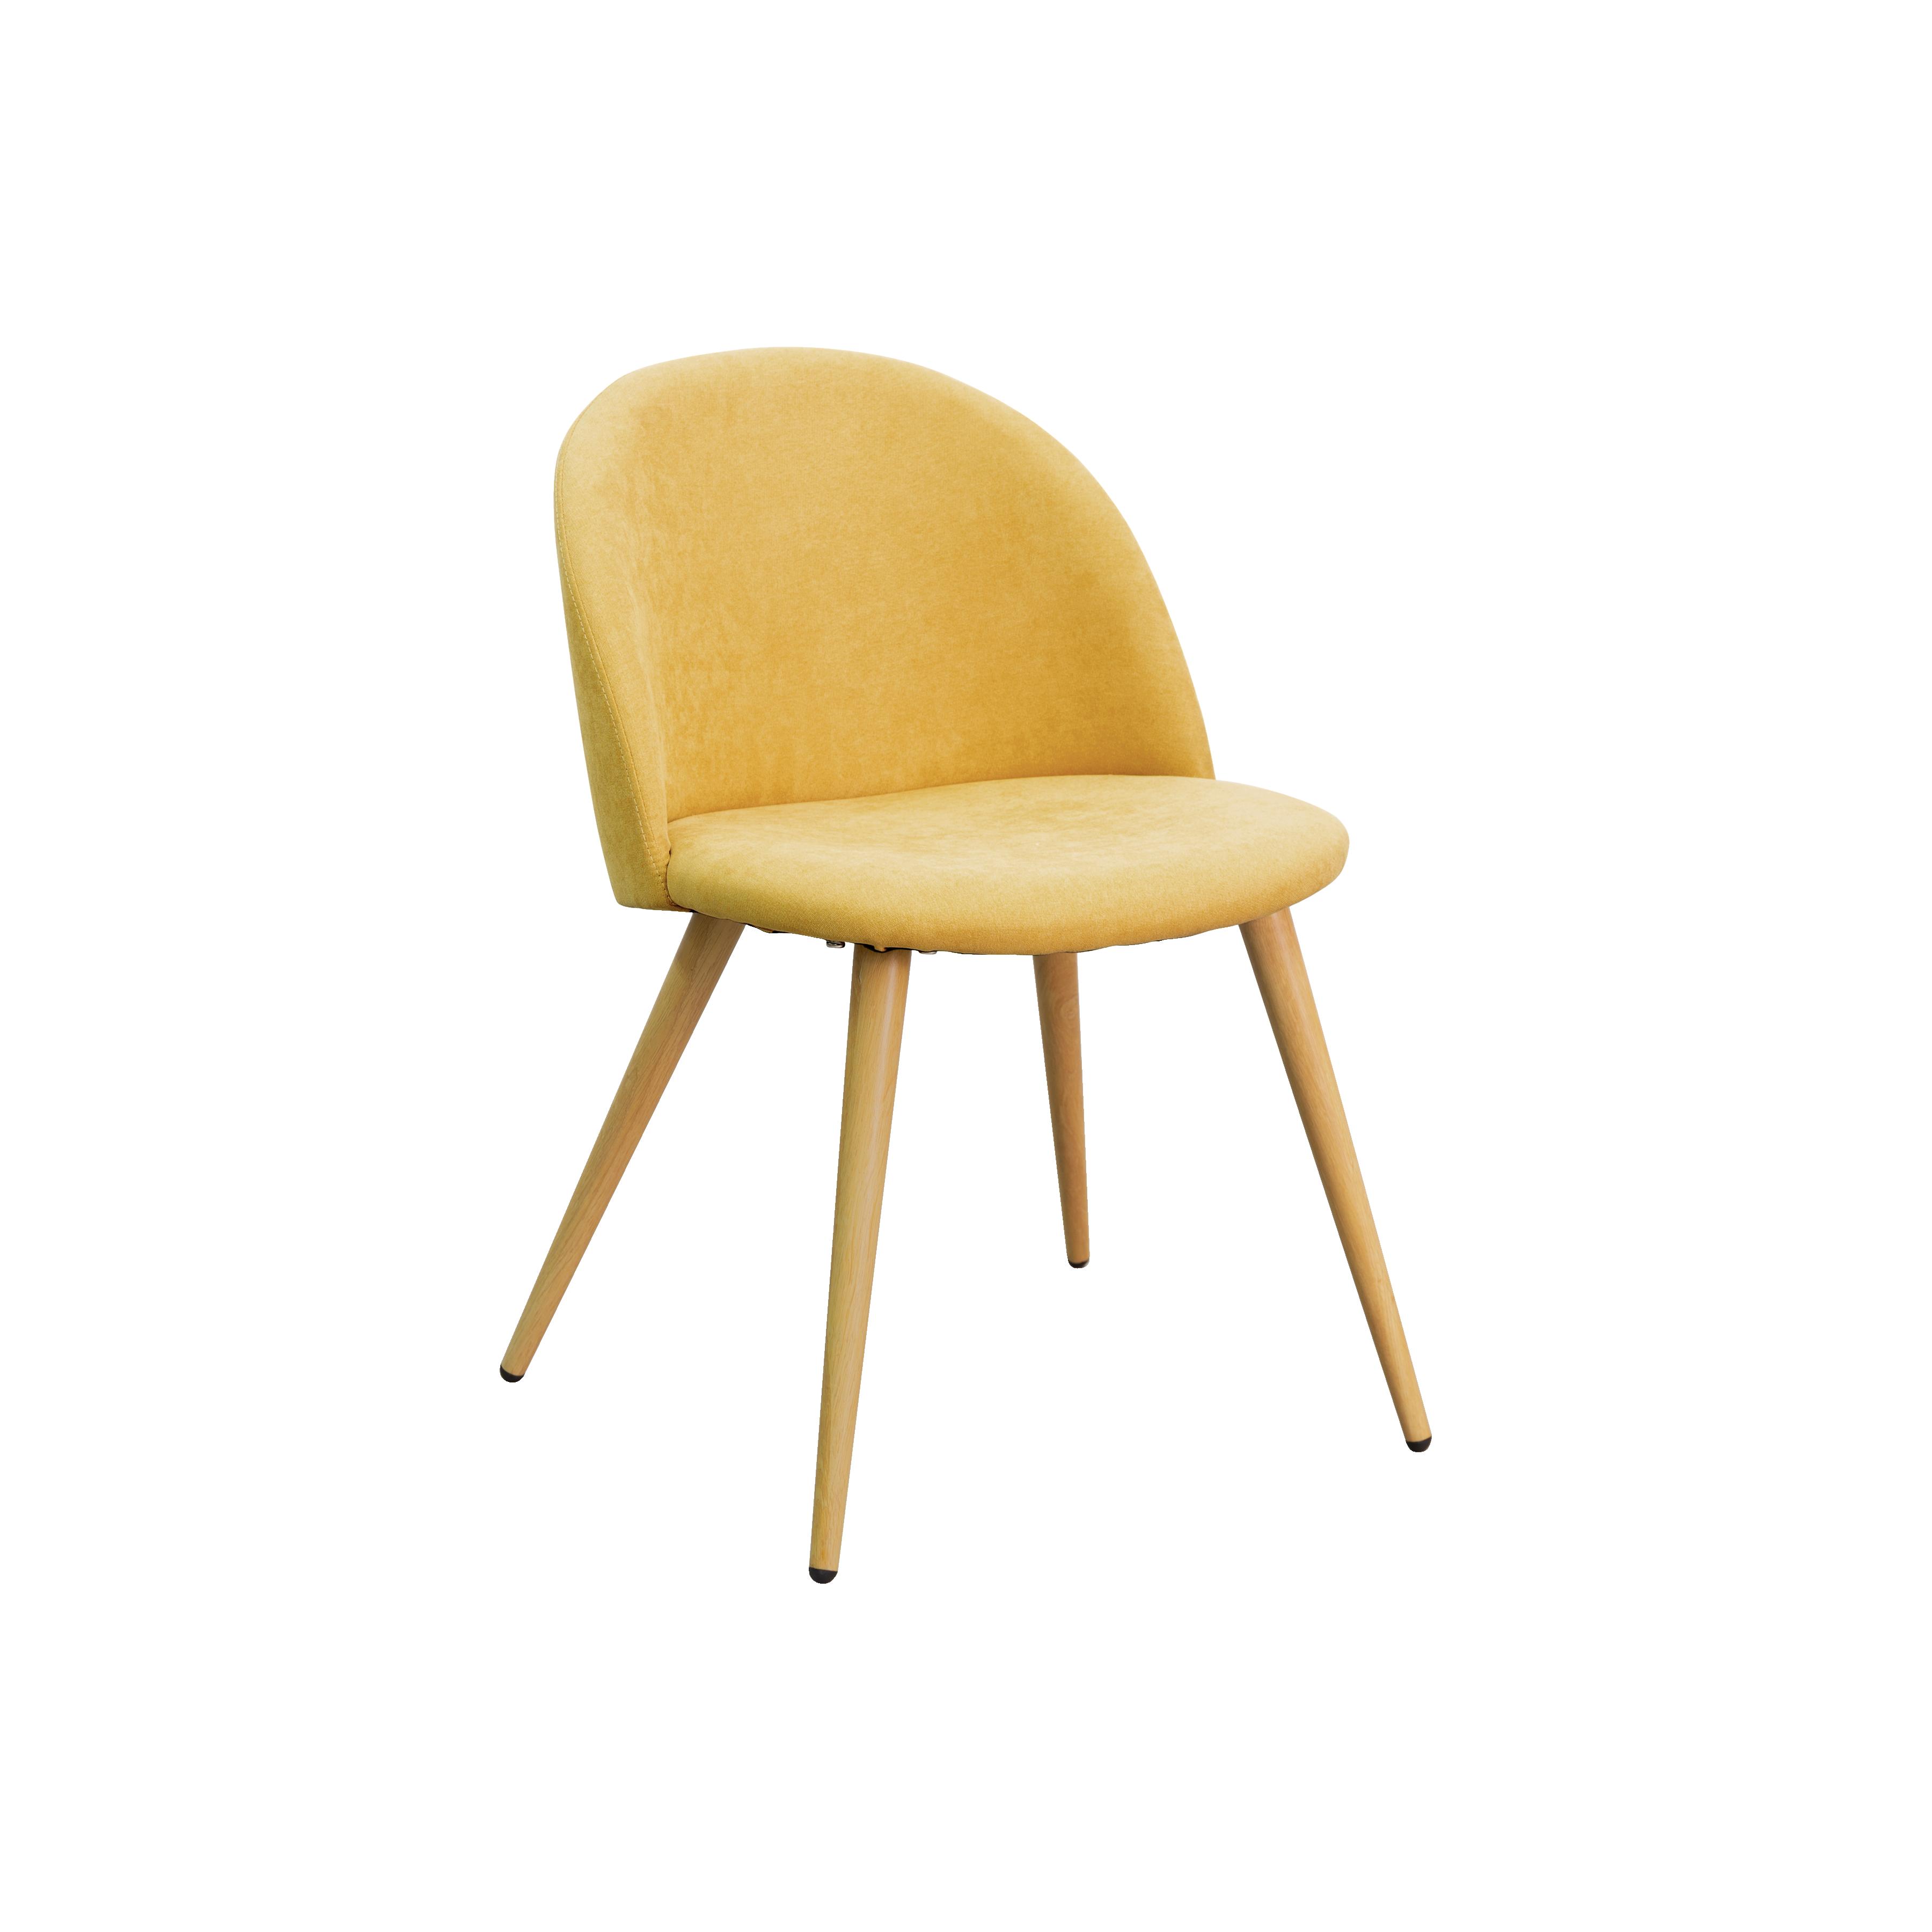 Chloe Dining Chair Sunshine Yellow Fabric Dining Chairs Yellow Dining Chairs Yellow Fabric